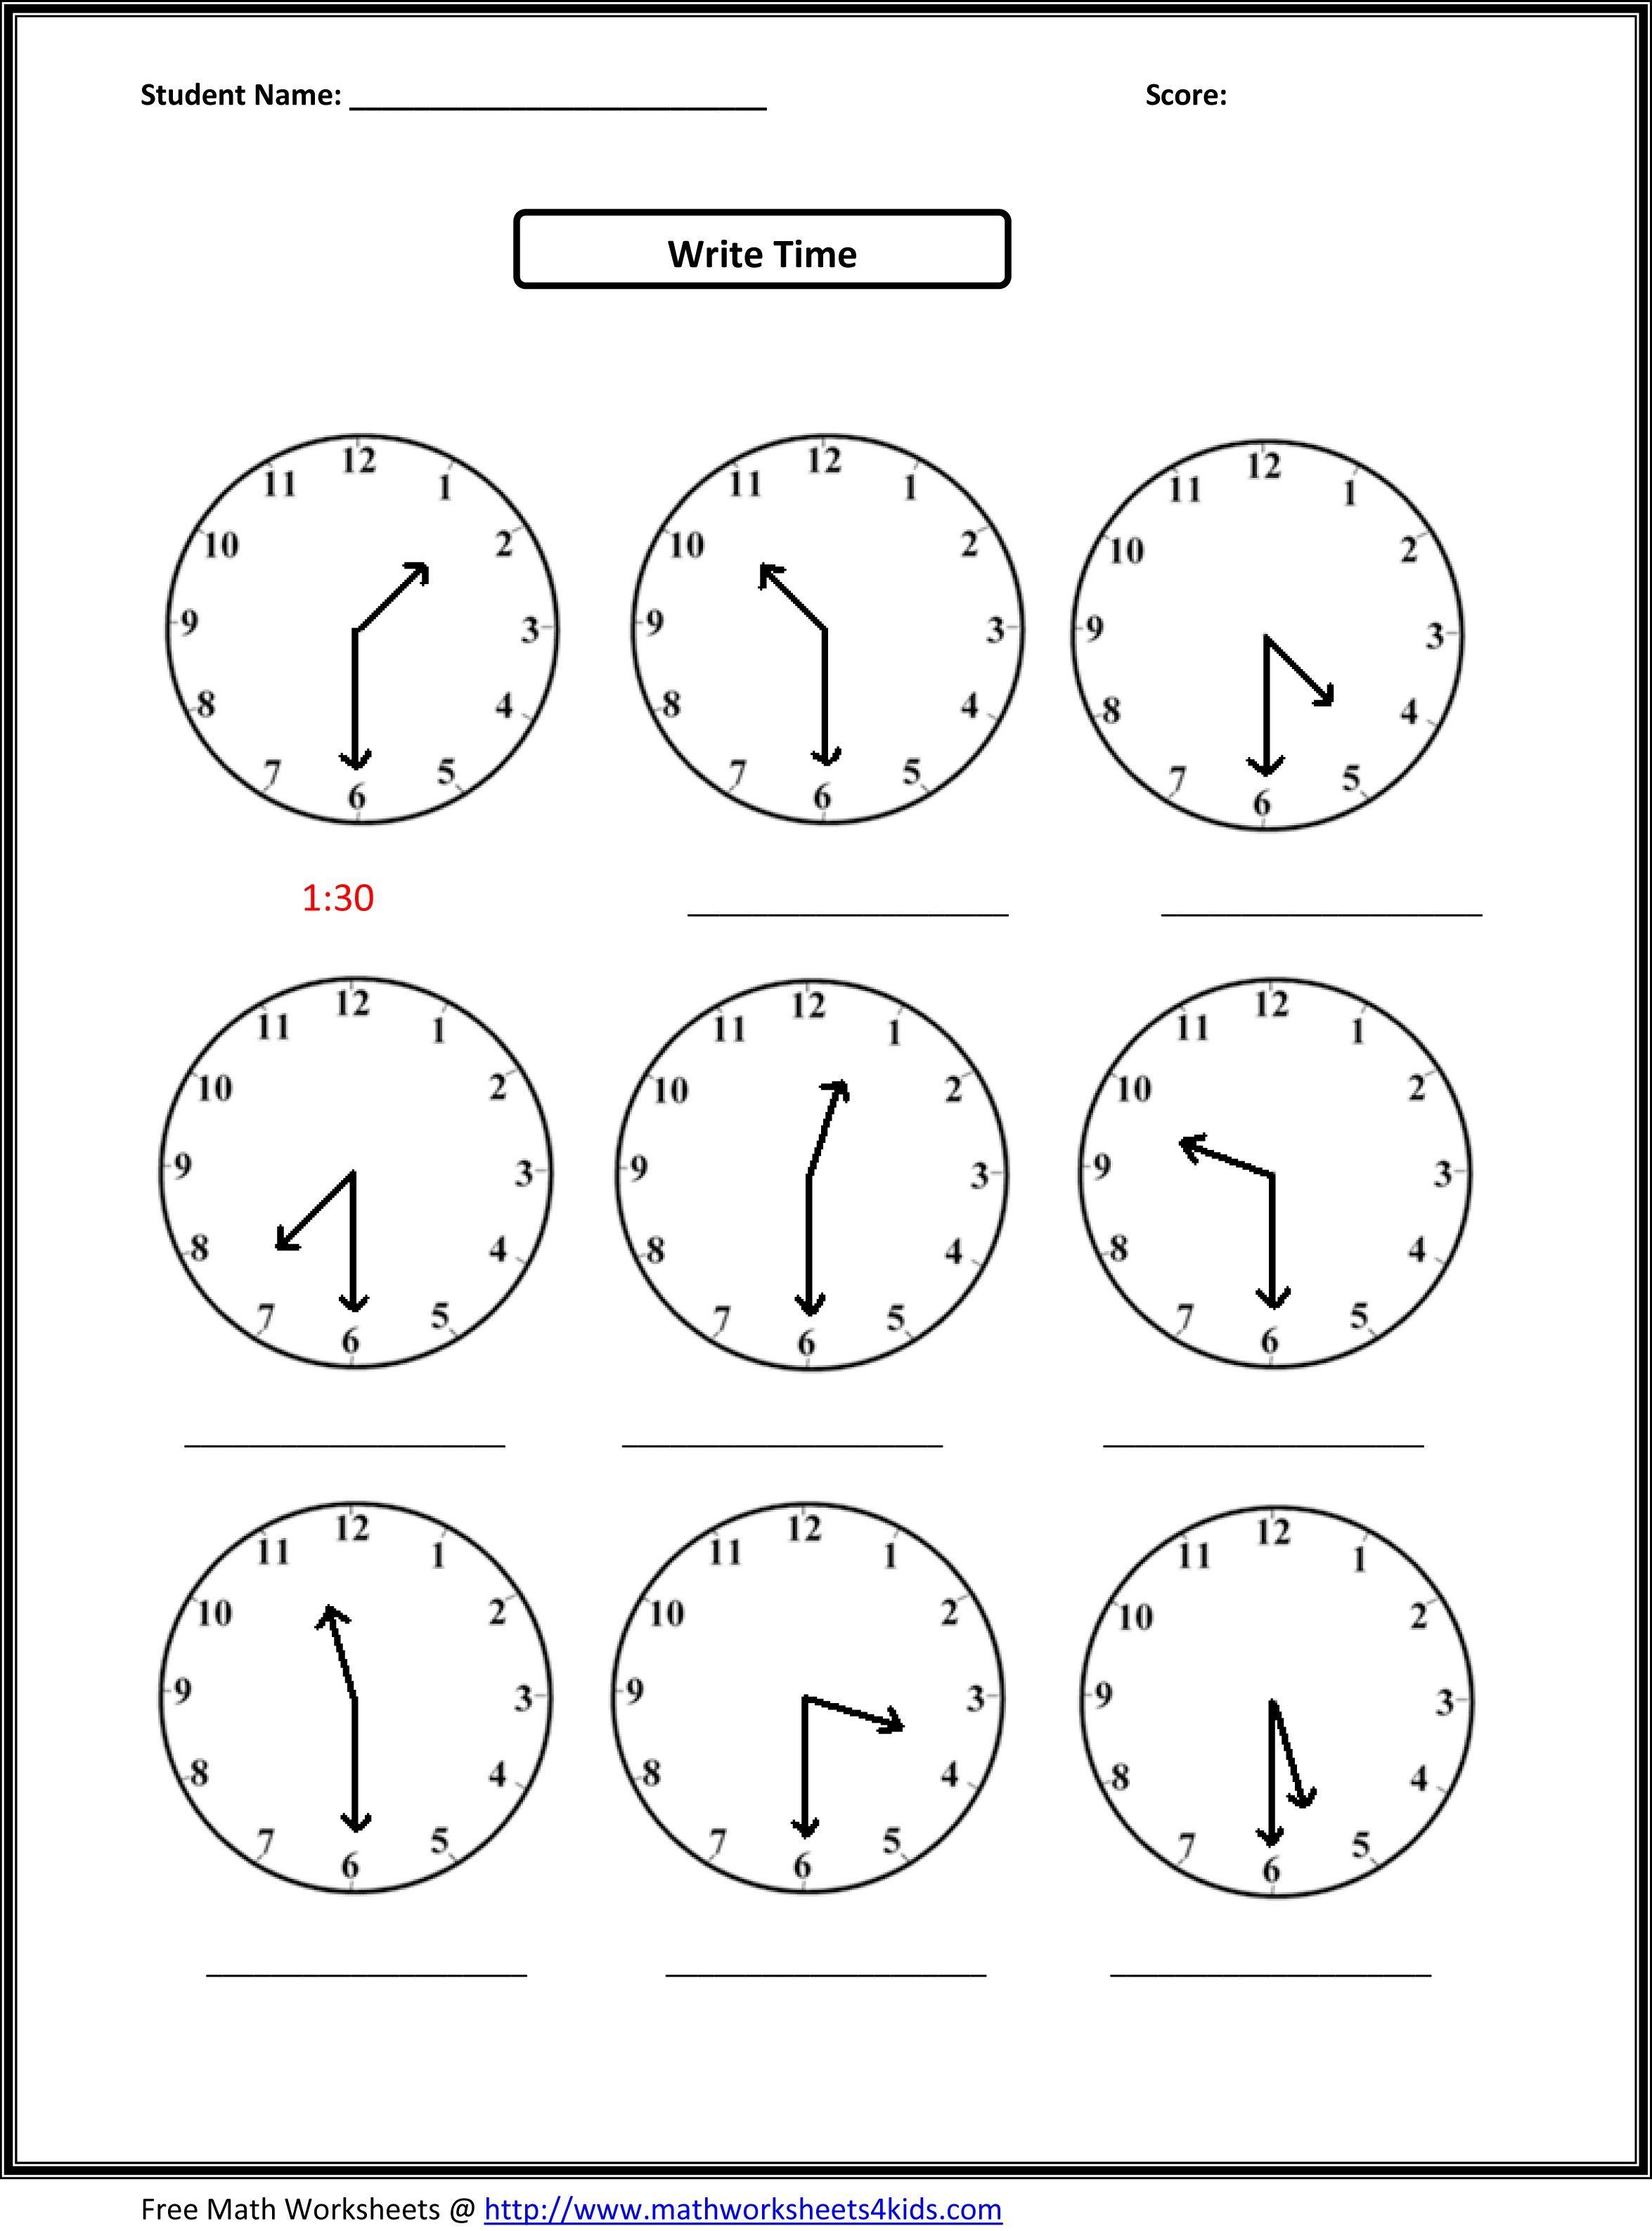 2Nd Grade Free Worksheets Math   Math: Time/measurement   2Nd Grade   Second Grade Printable Worksheets